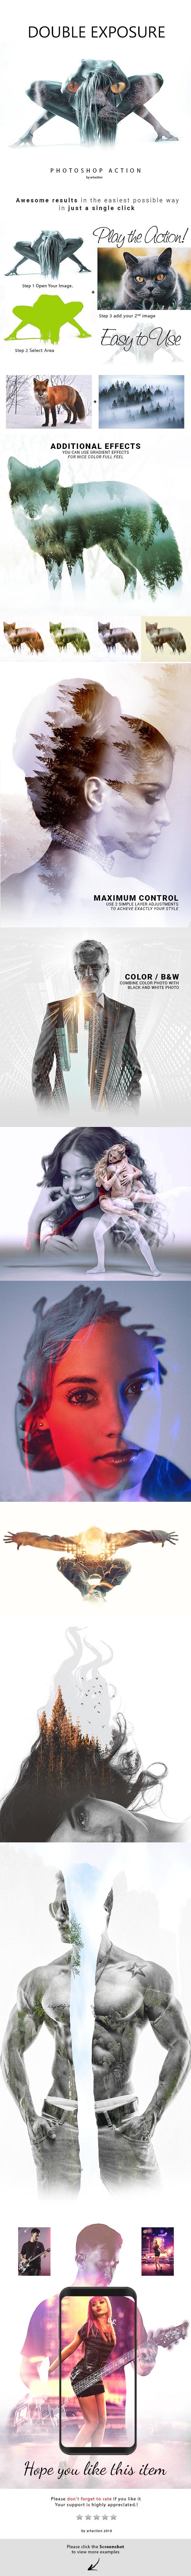 Double Exposure Photoshop Action-2